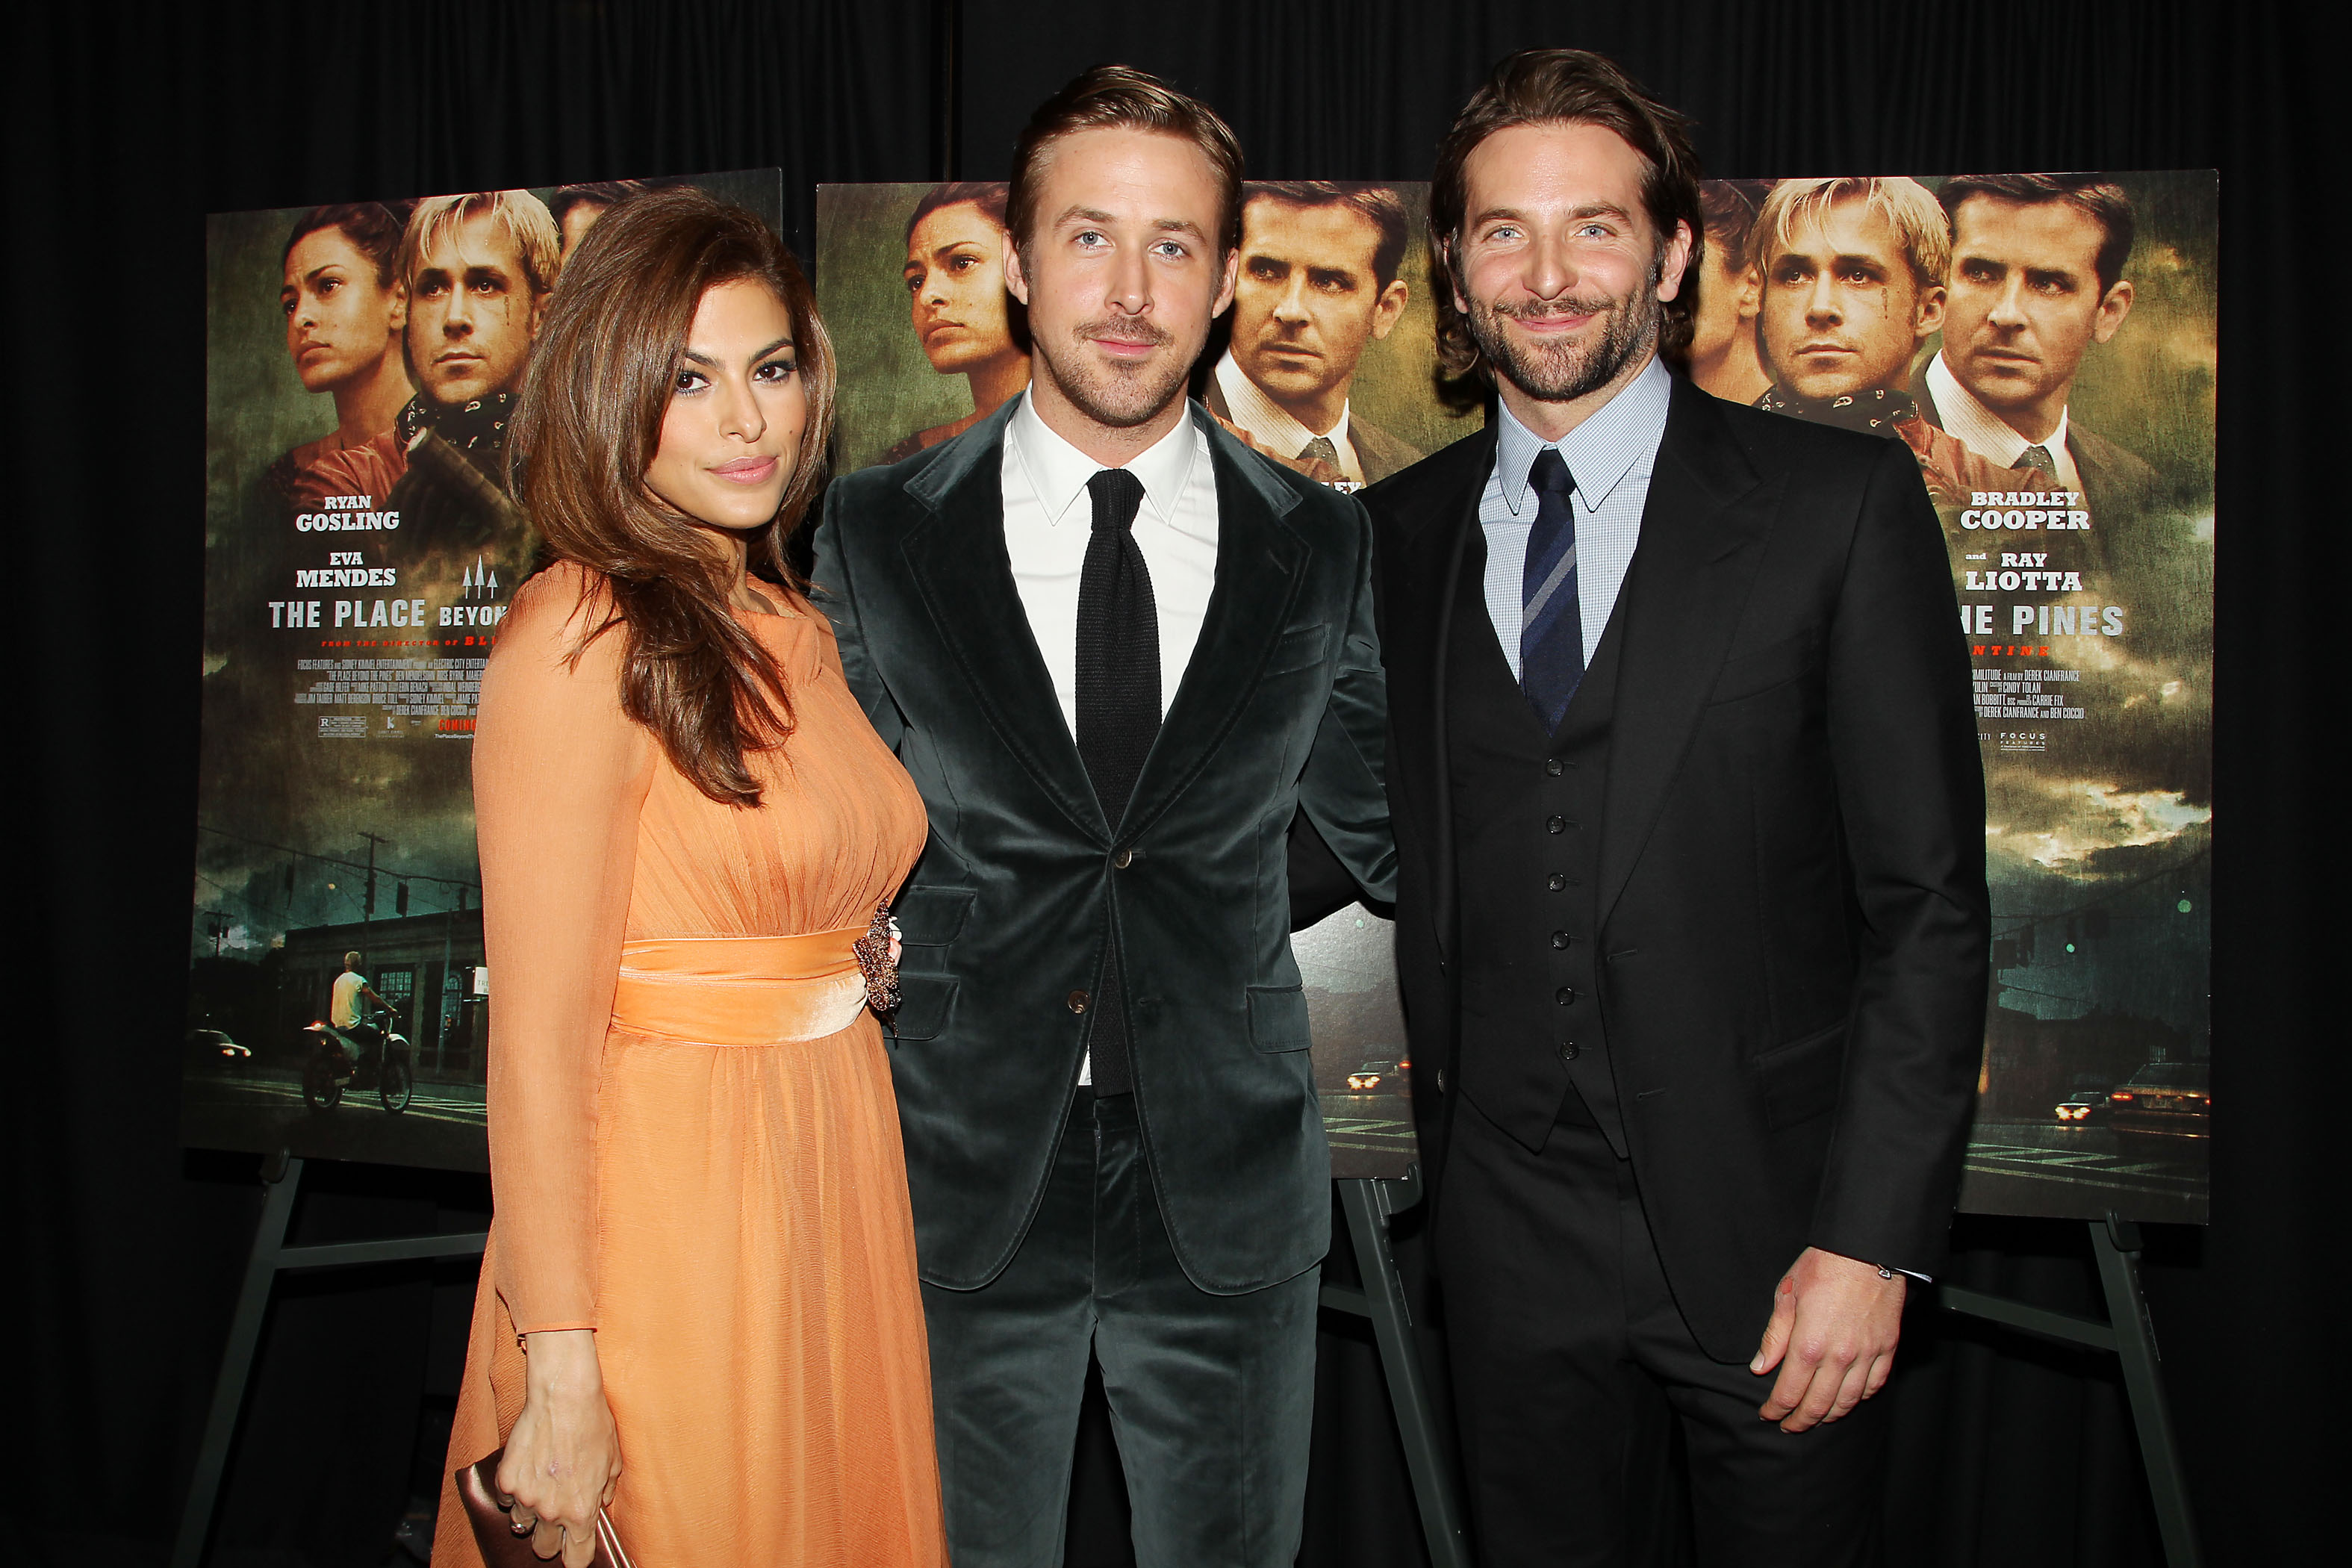 Eva Mendes, Ryan Gosling, Bradley Cooper